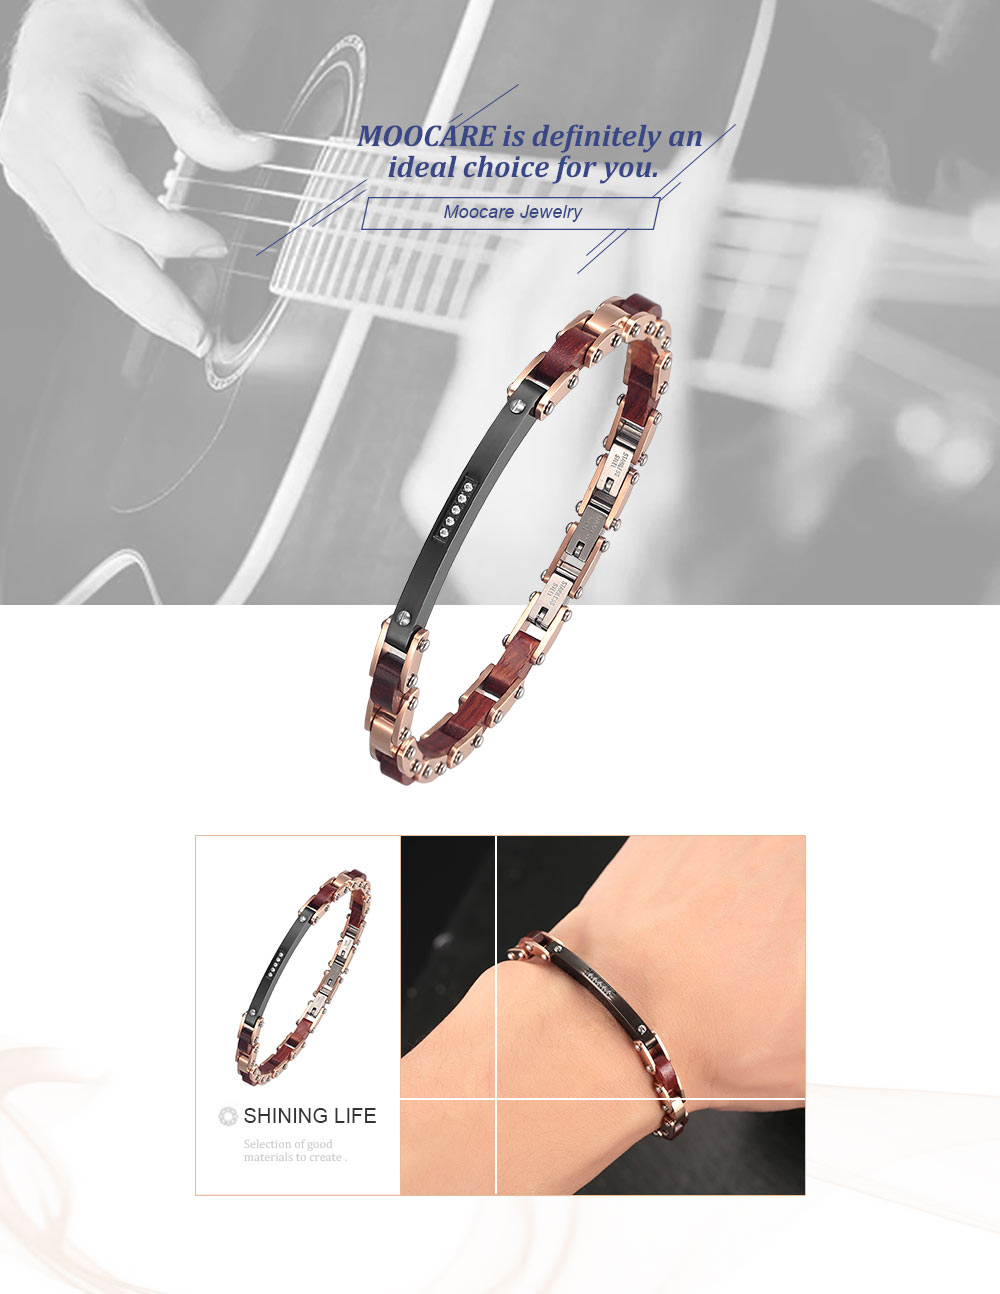 Moocare women men bracelets rose gold stainless steel wool charm chain wristband male female bangles bracelet drop shopping